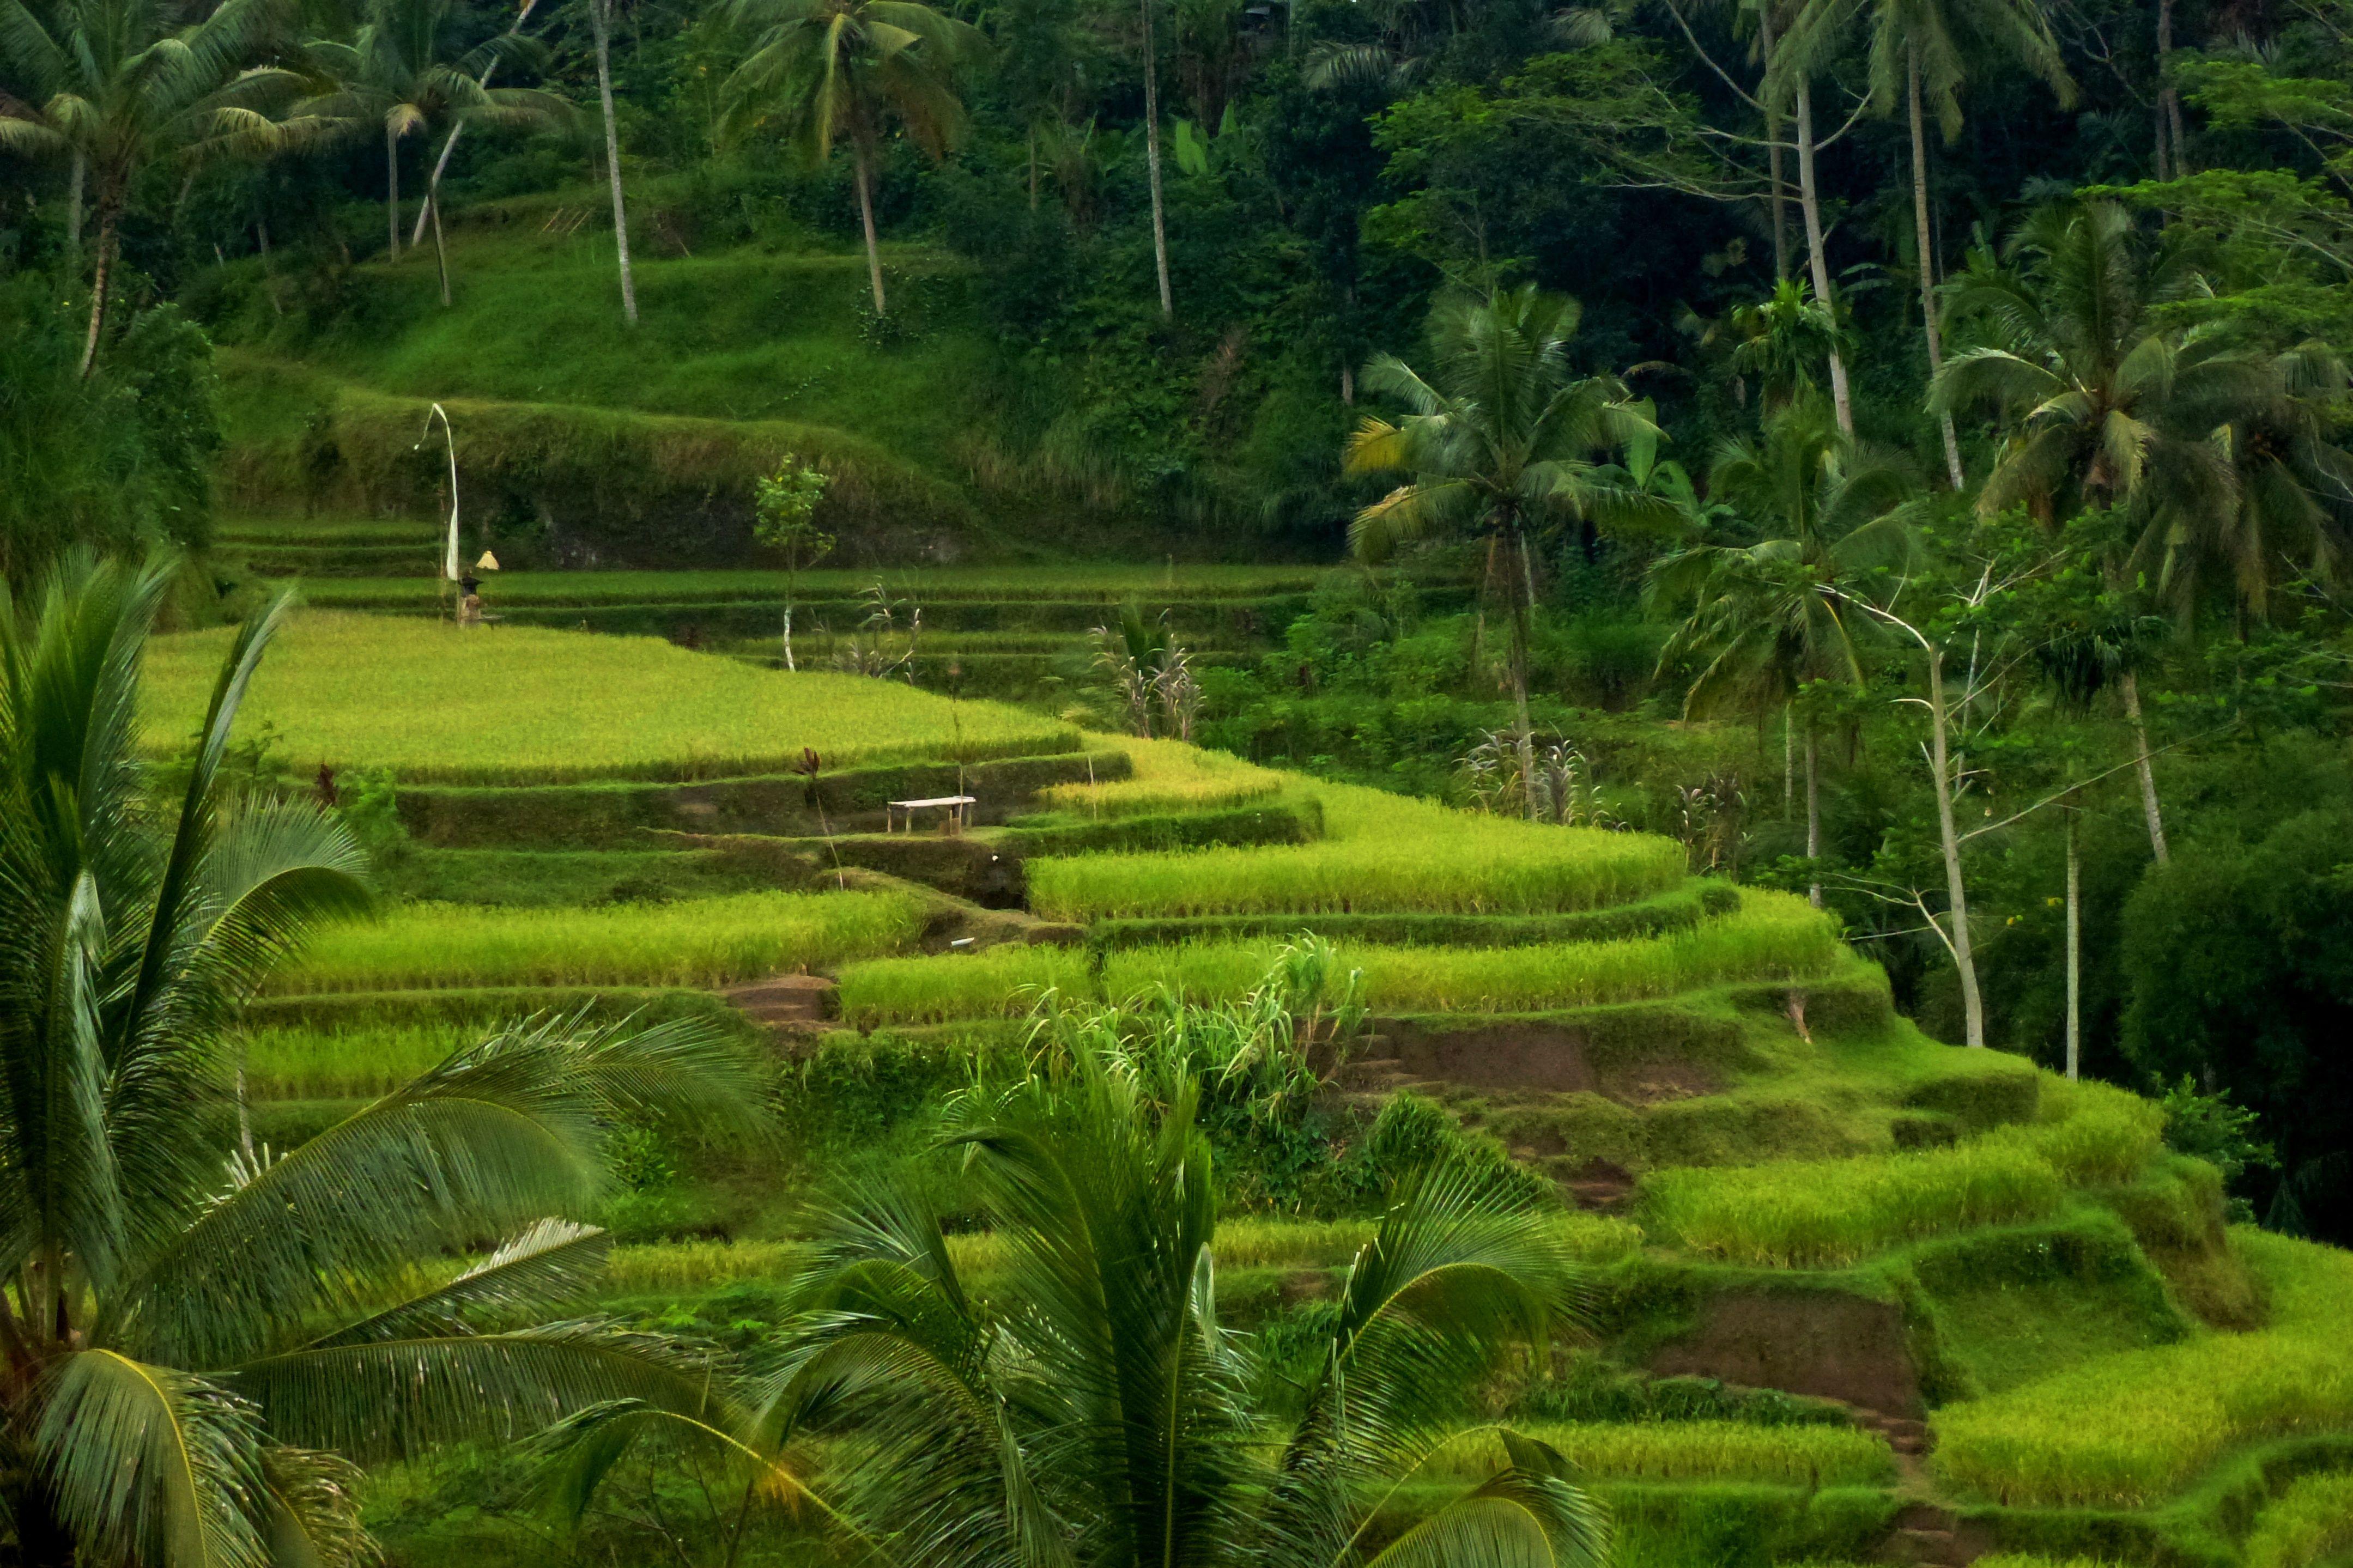 The famous rice terraces of tegalalang ubud bali bali for Terrace ubud bali